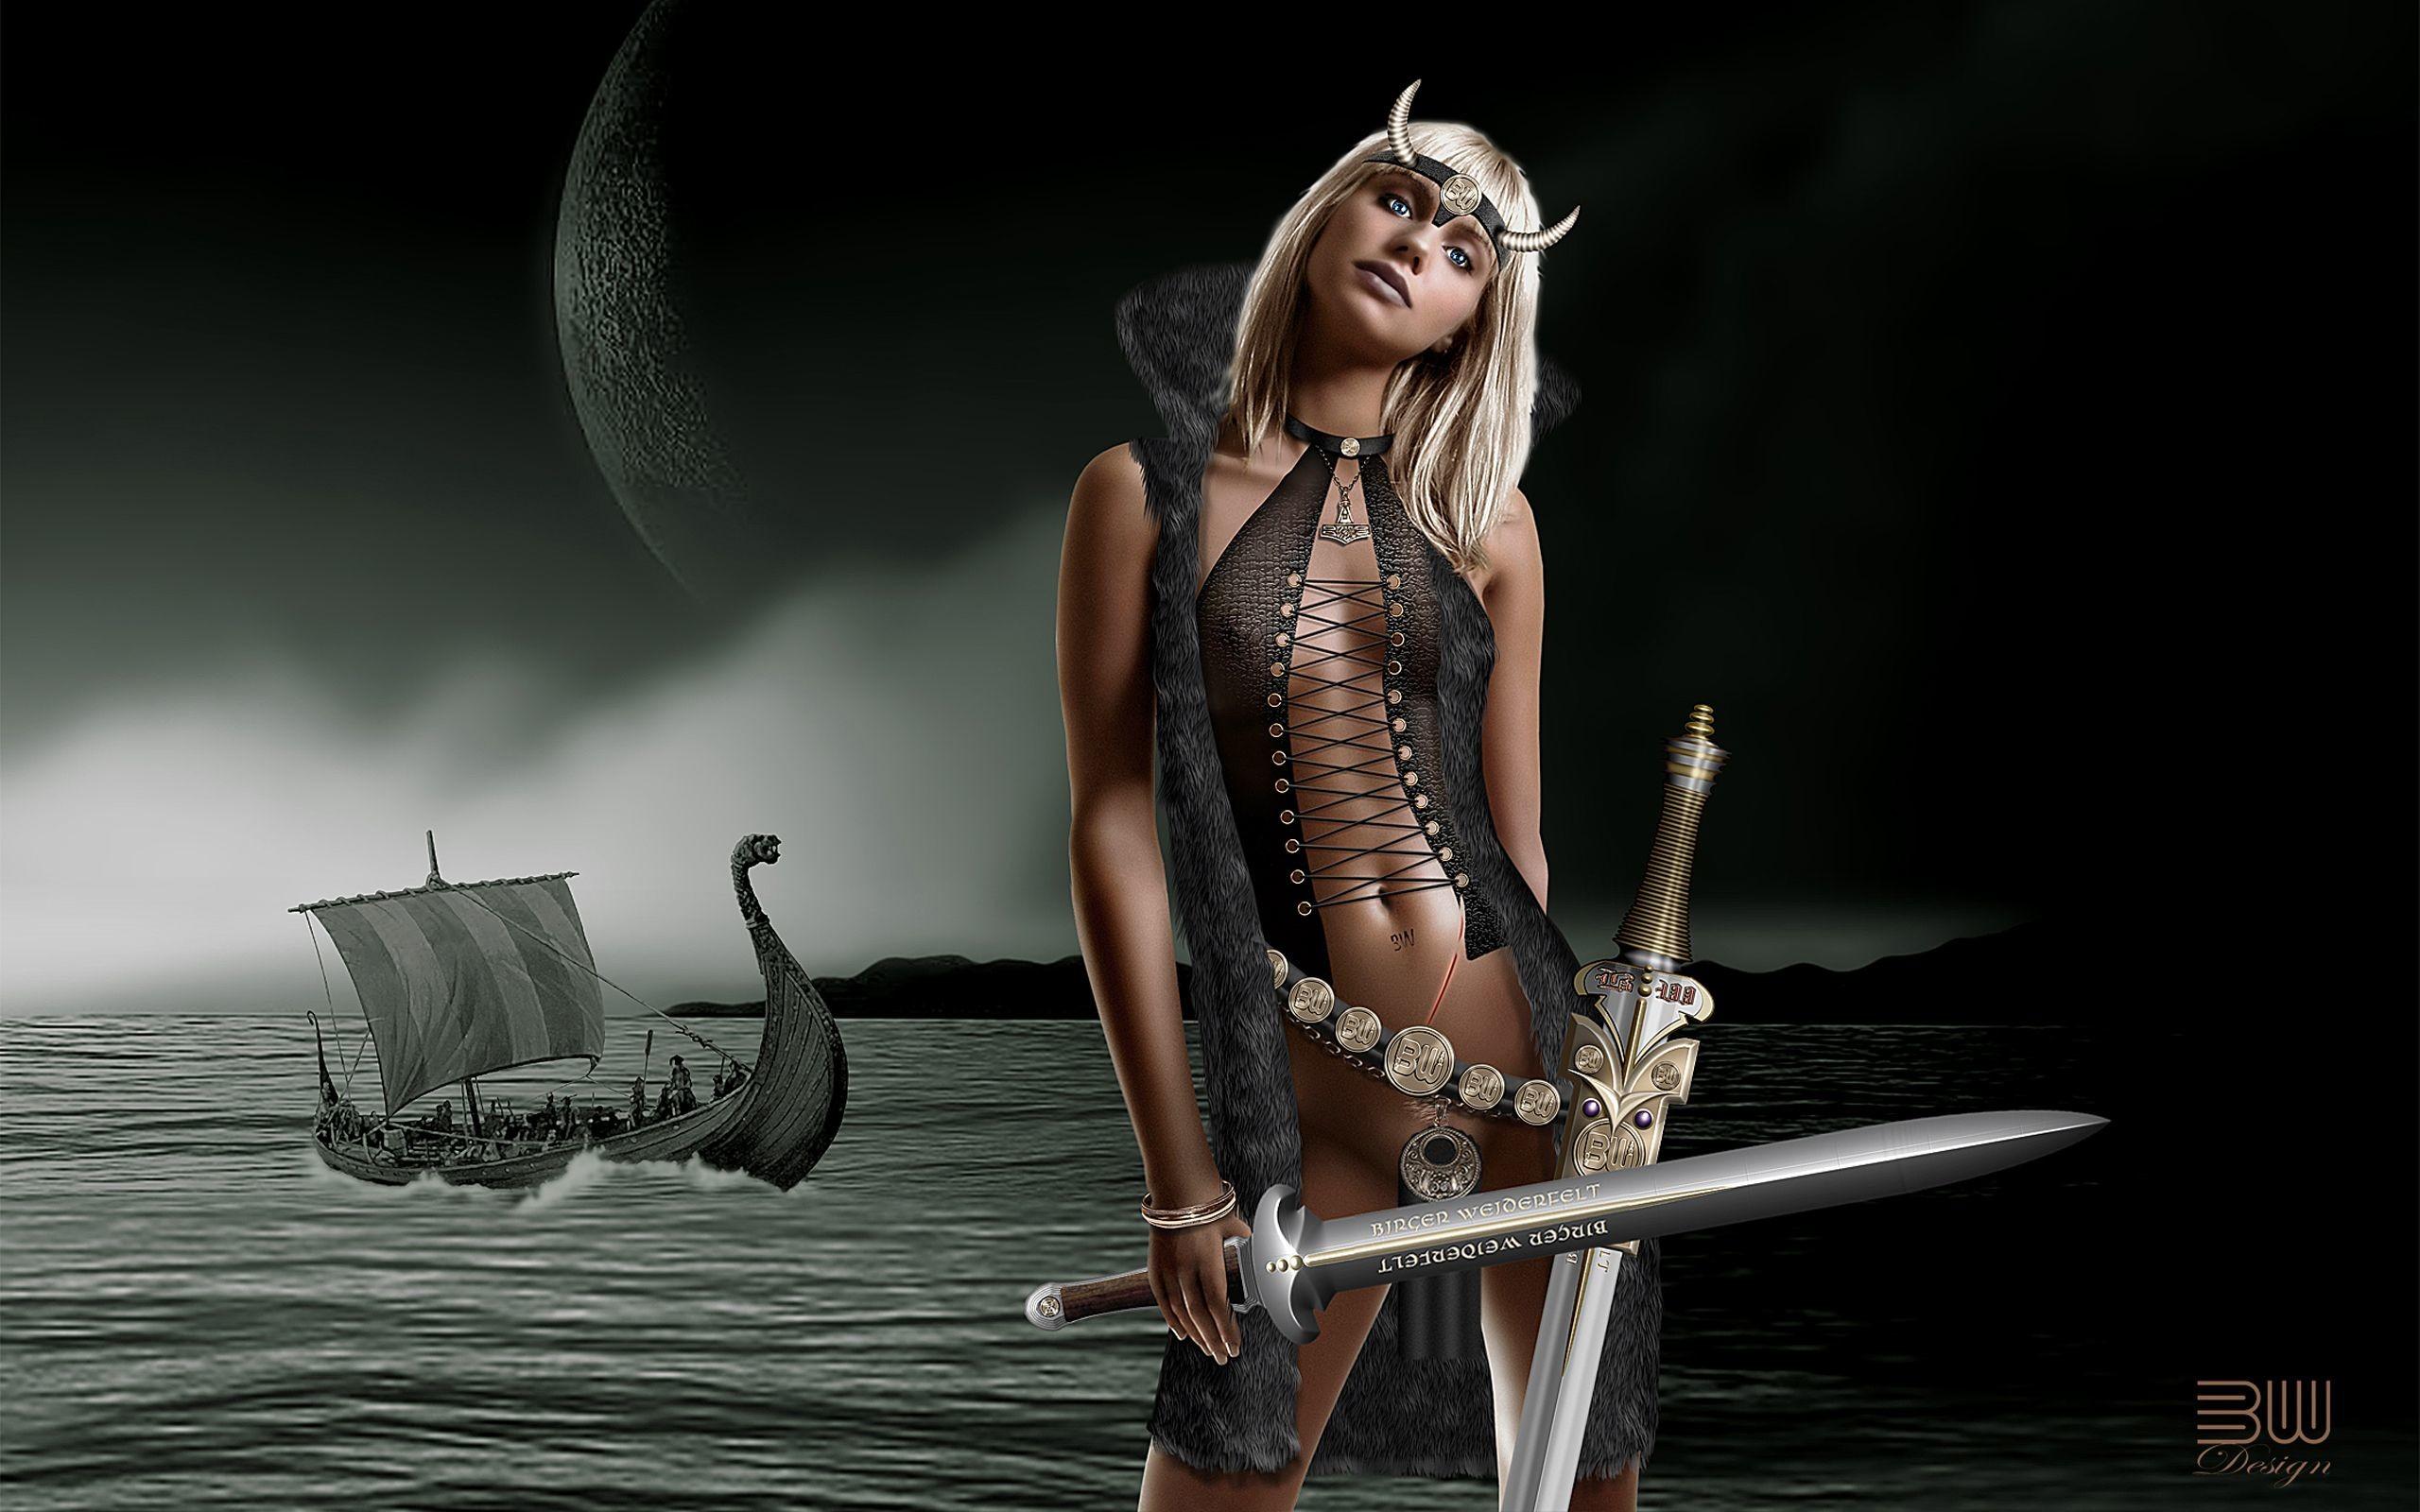 viking woman Wallpaper Background   26526